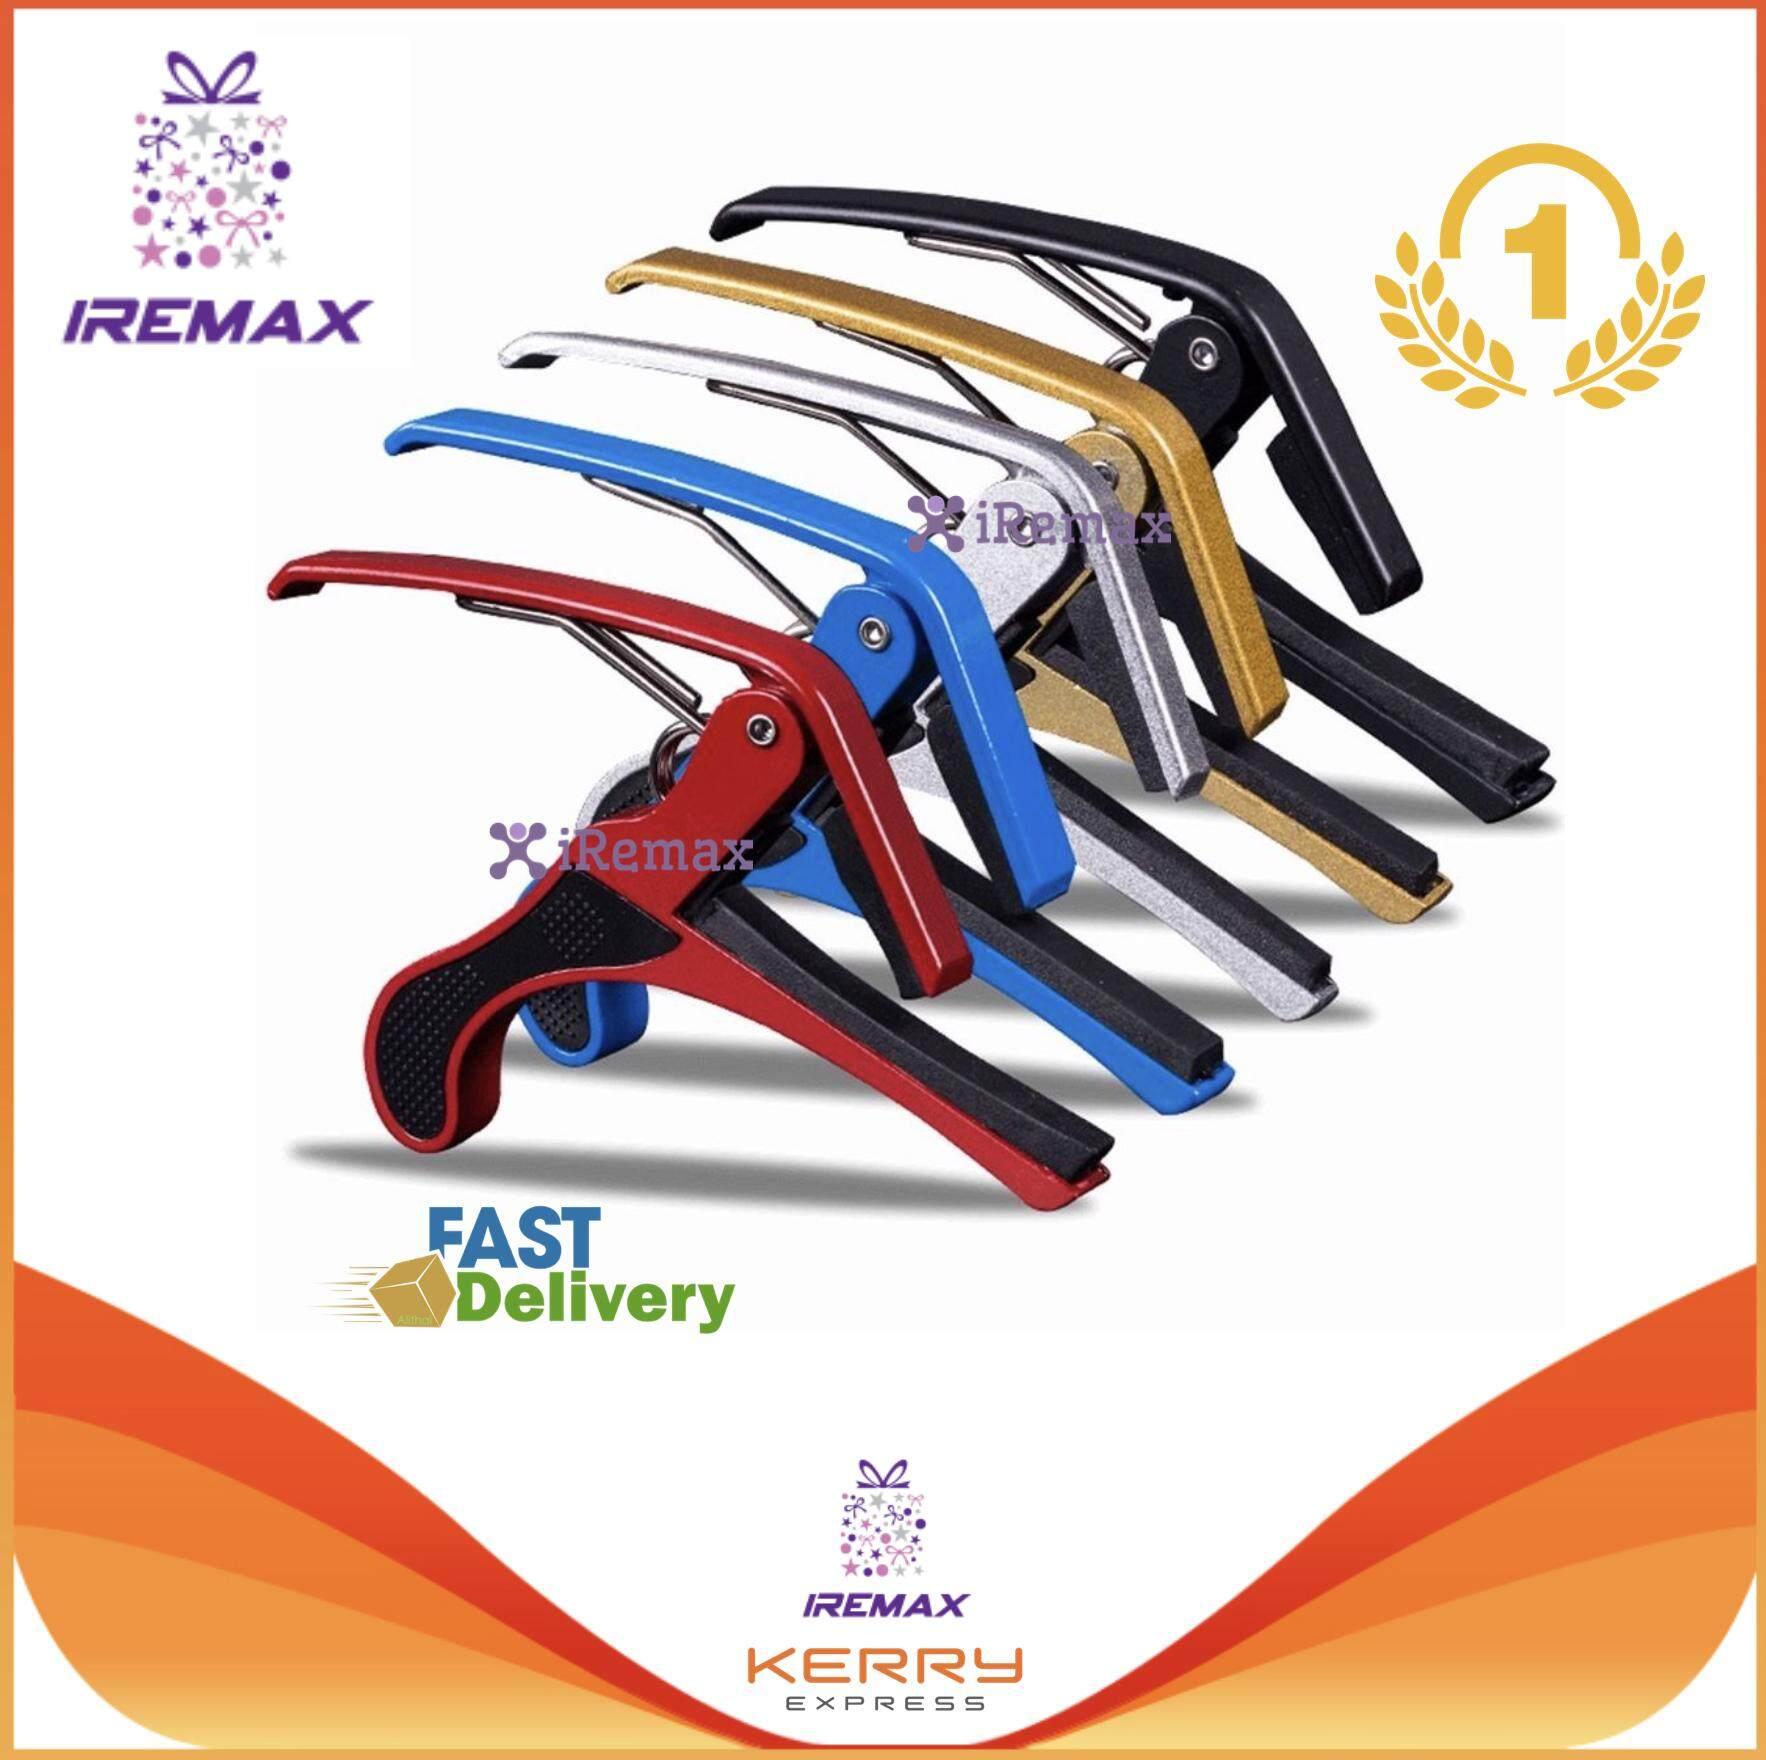 Iremax At First Capo คาโป้ กีตาร์ (1pc) By Iremax.